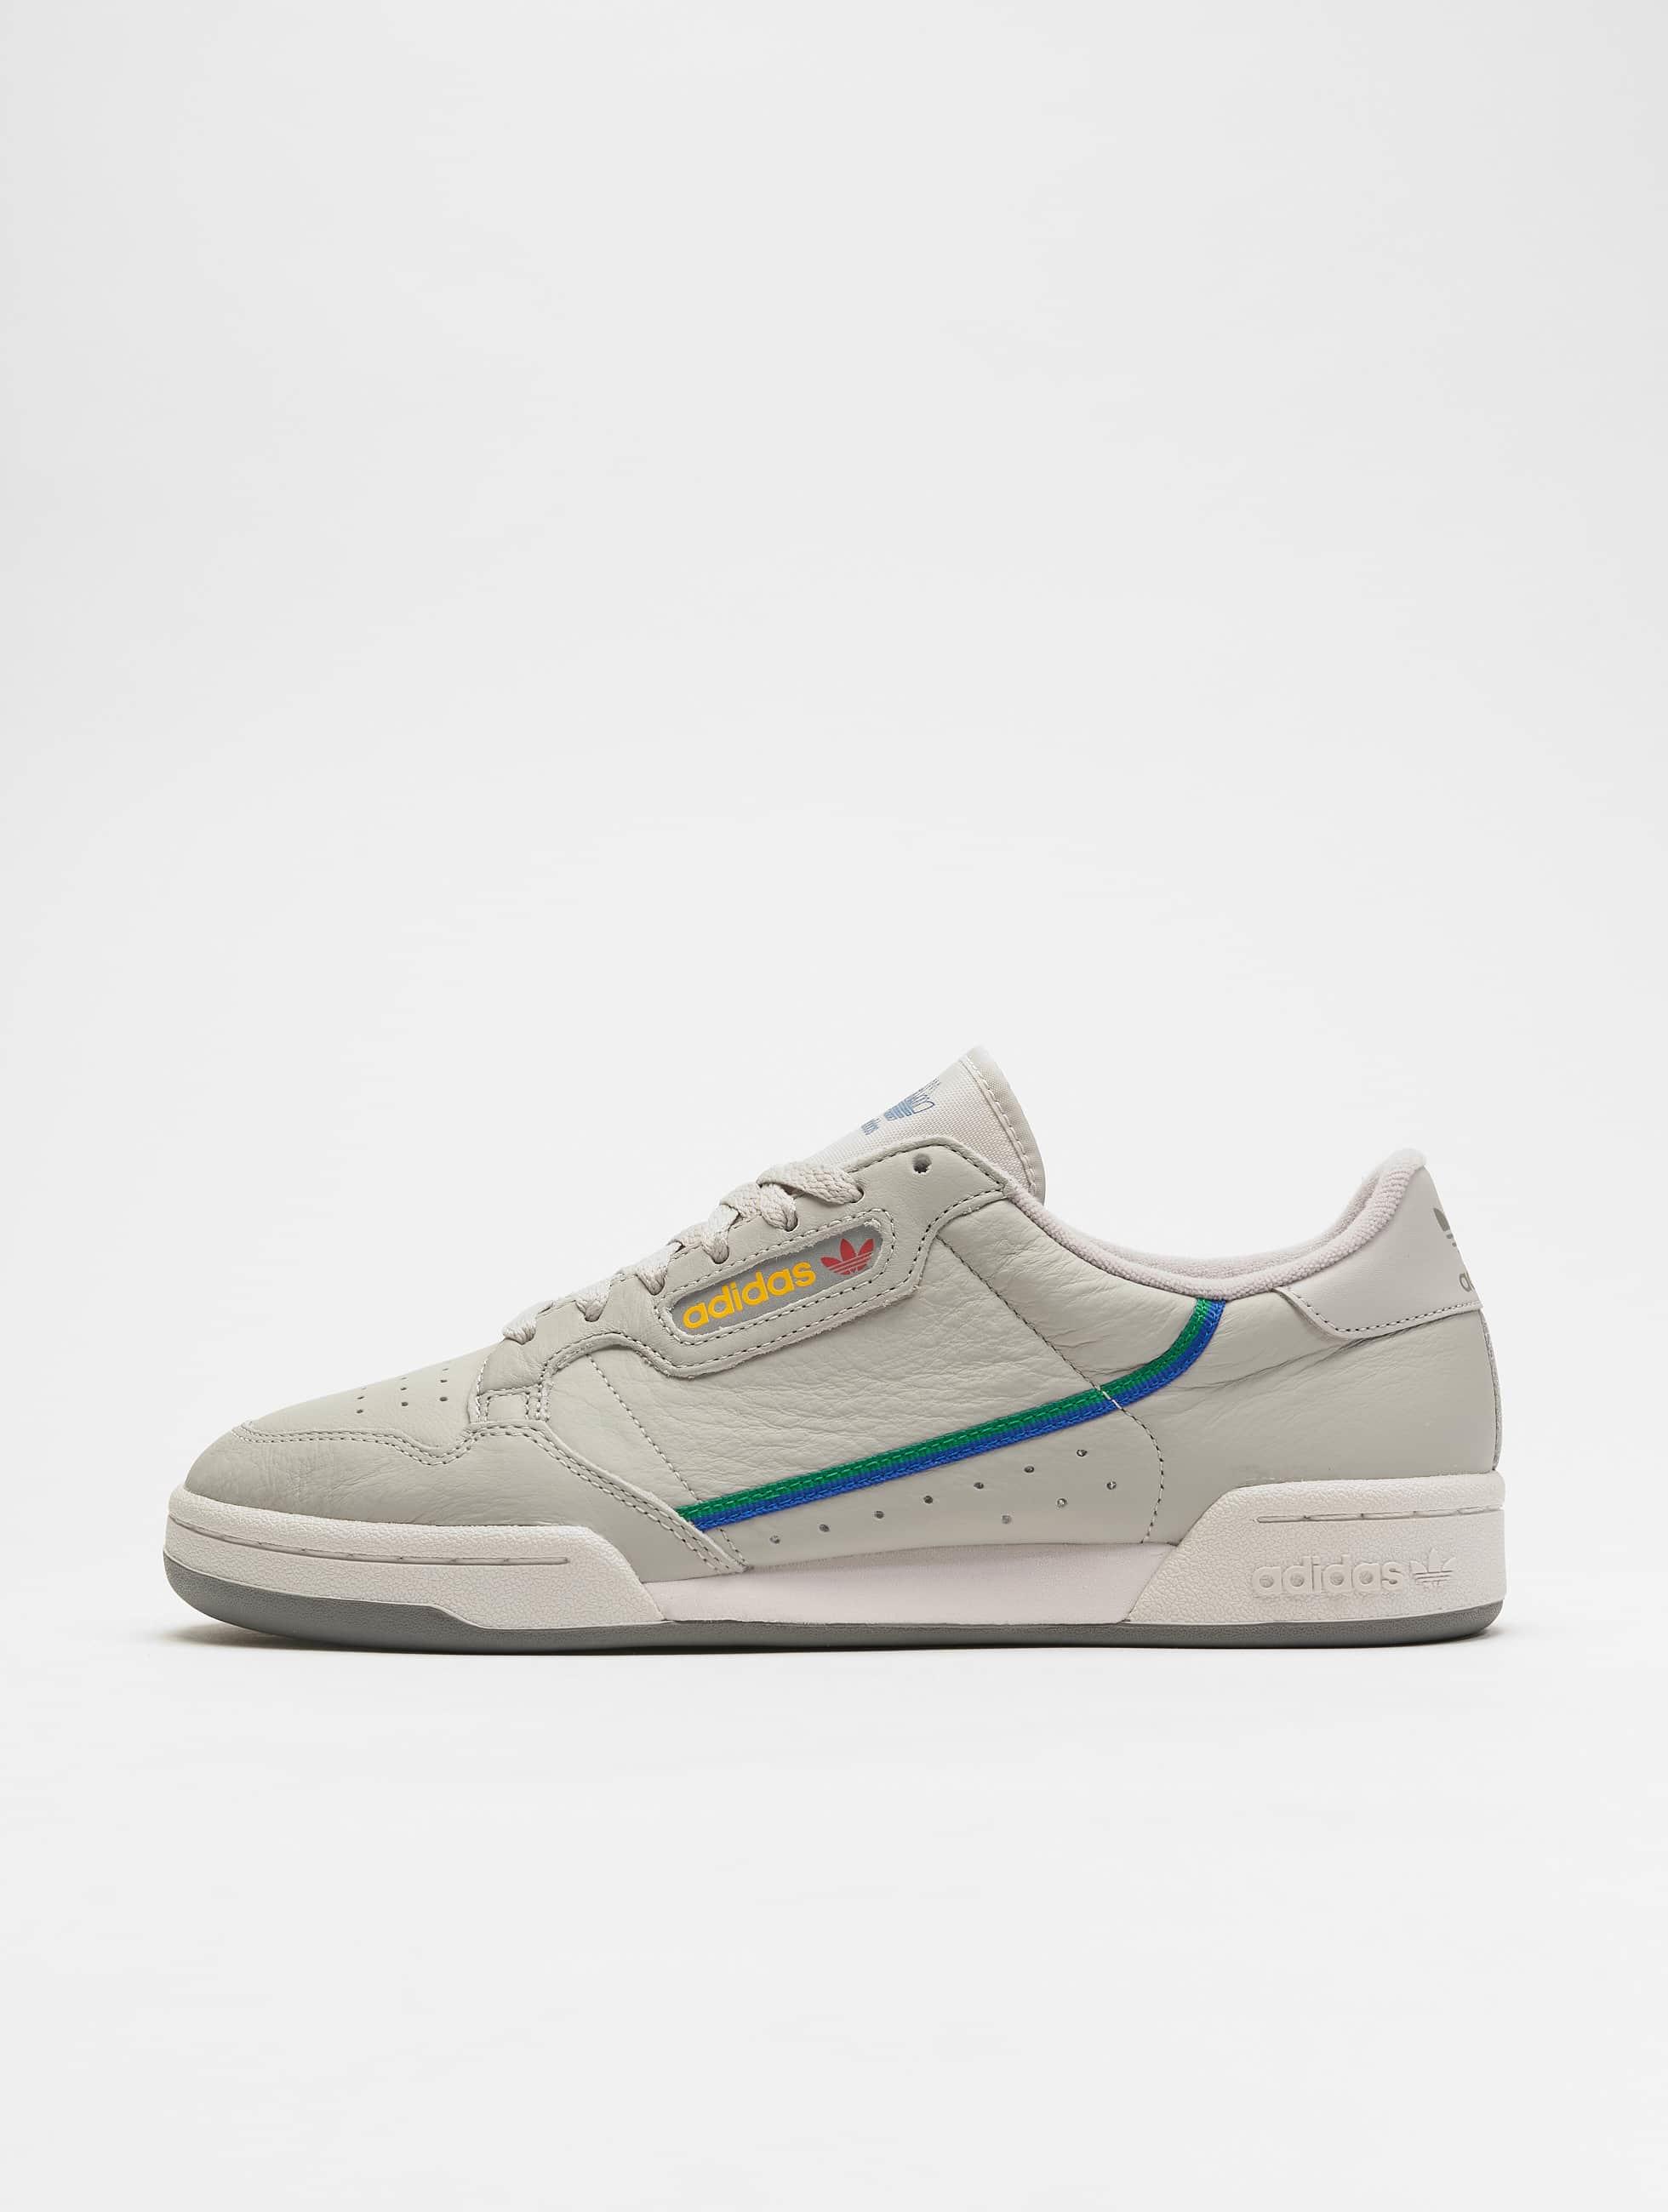 Originals 80 Adidas Continental Sneakers Gretwogreonescarle pGSUMVqzL